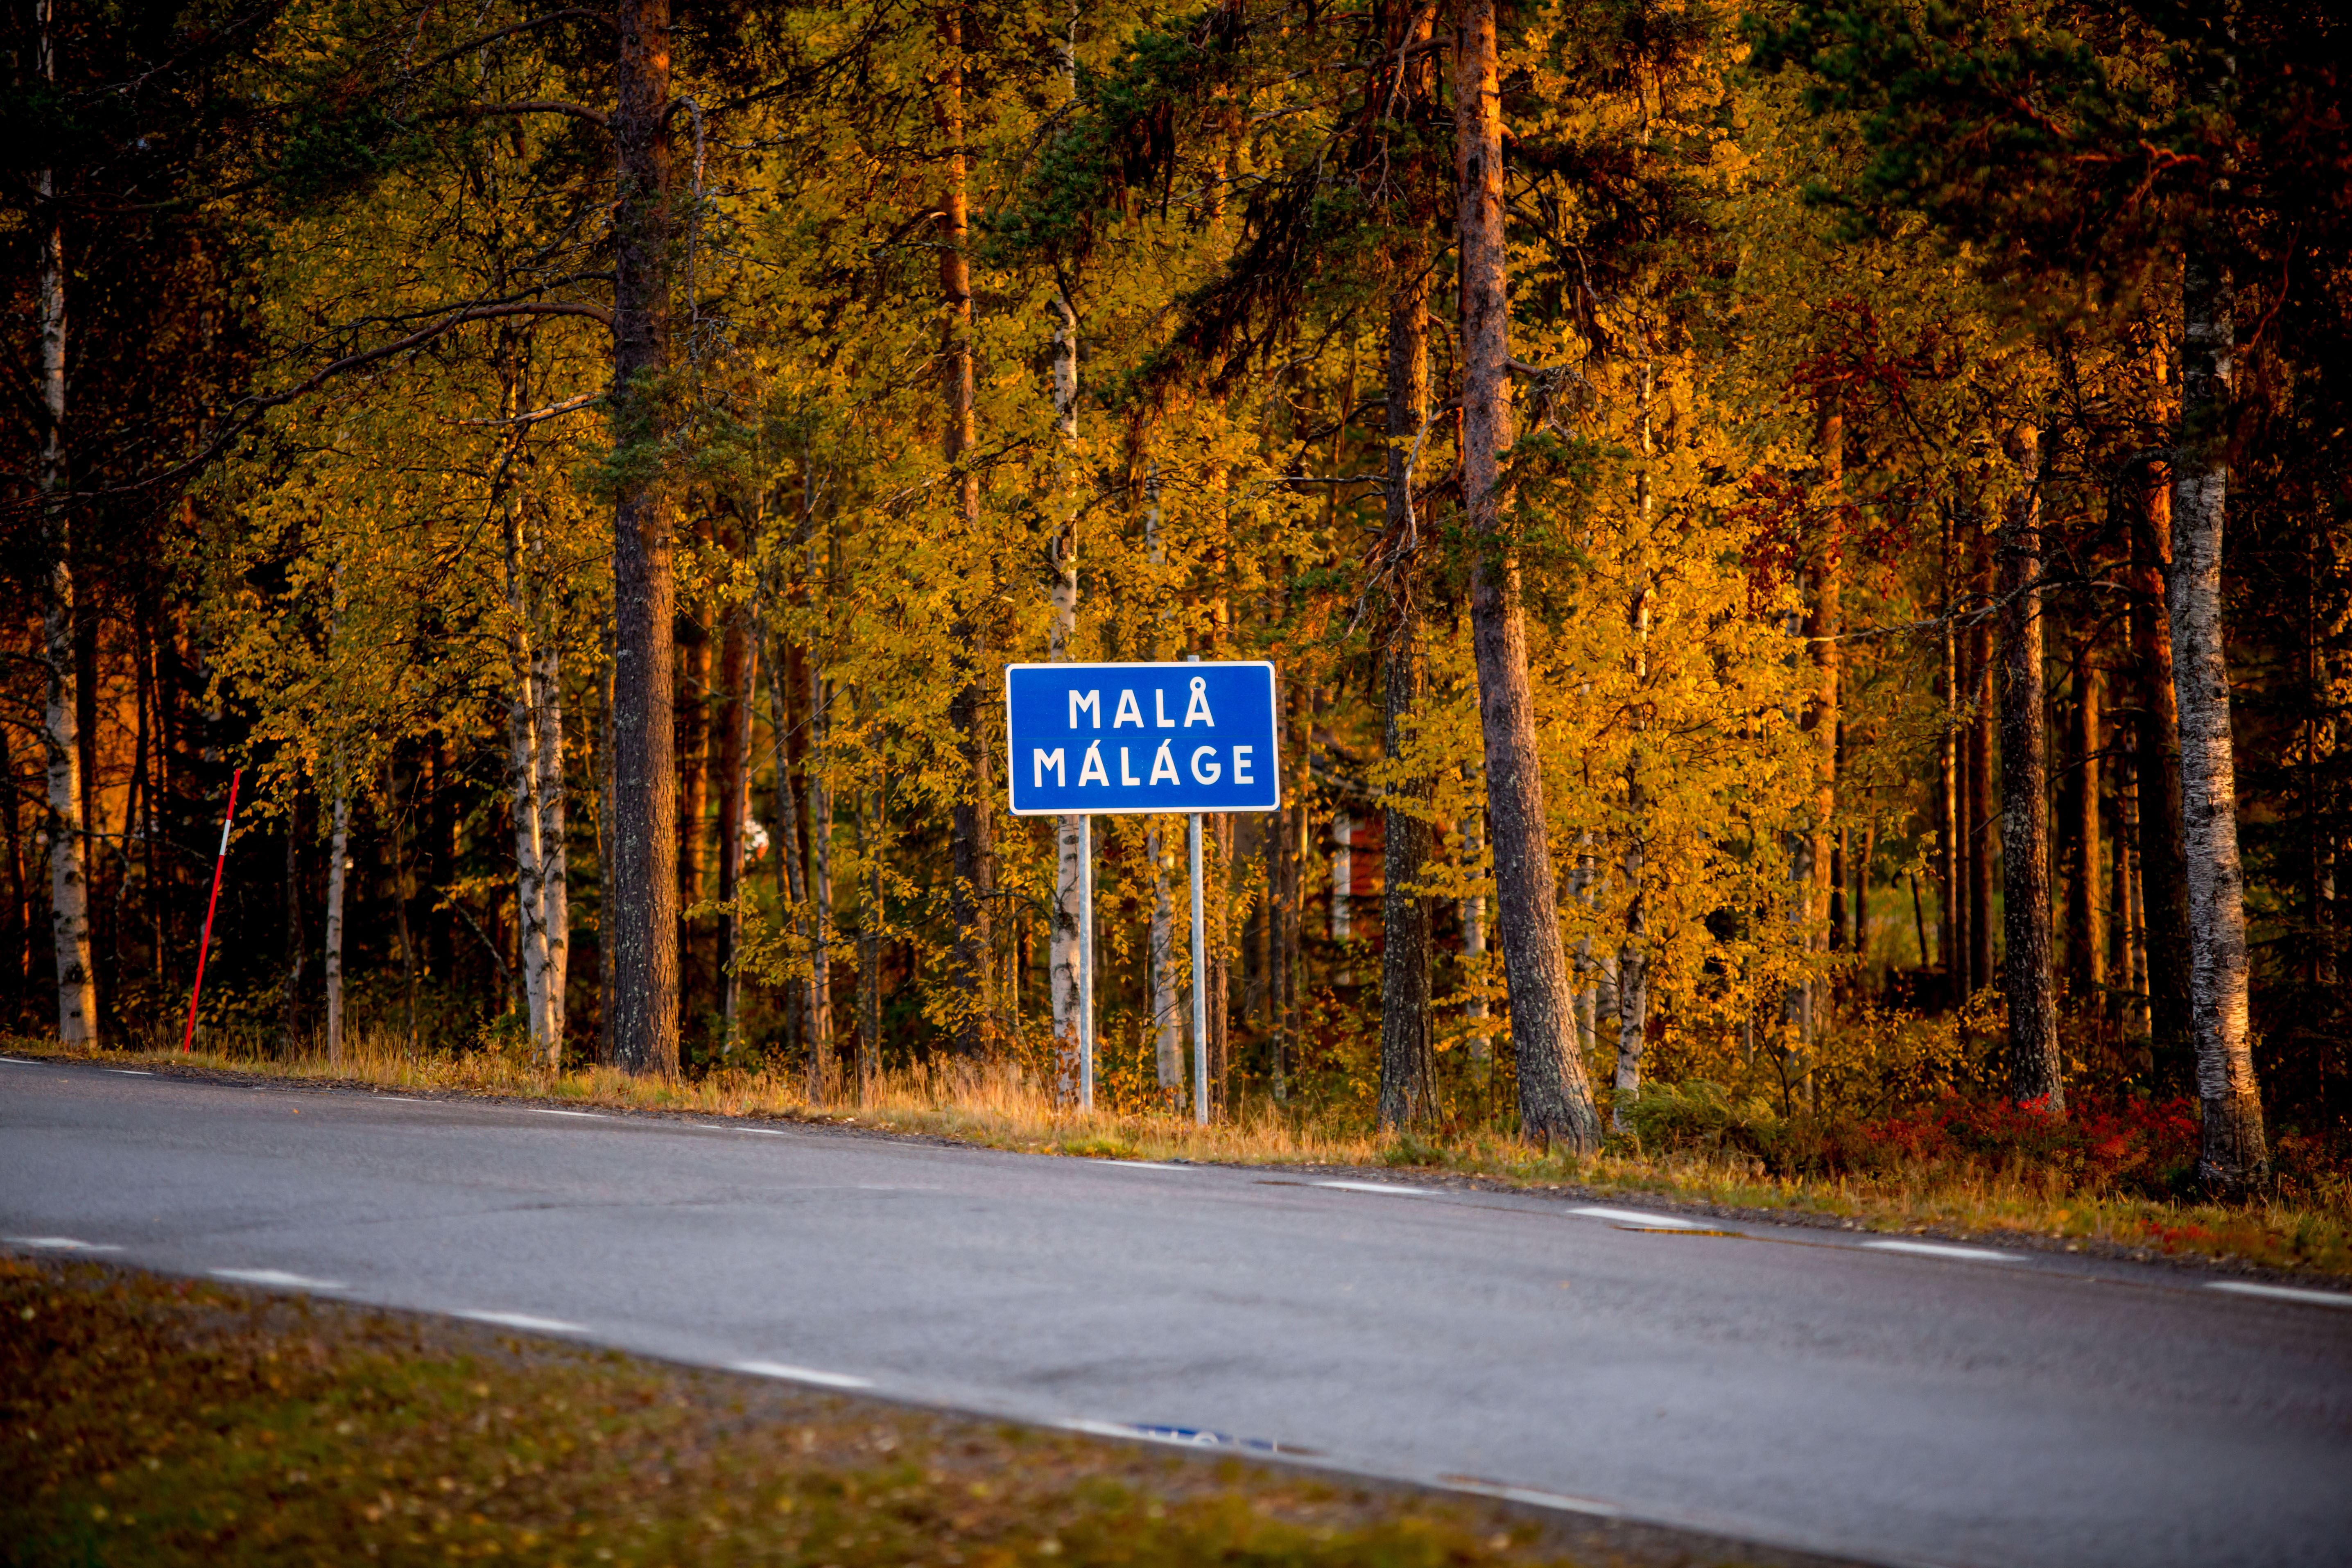 www.ricke.se,  © Malå kommun, The future of small villages